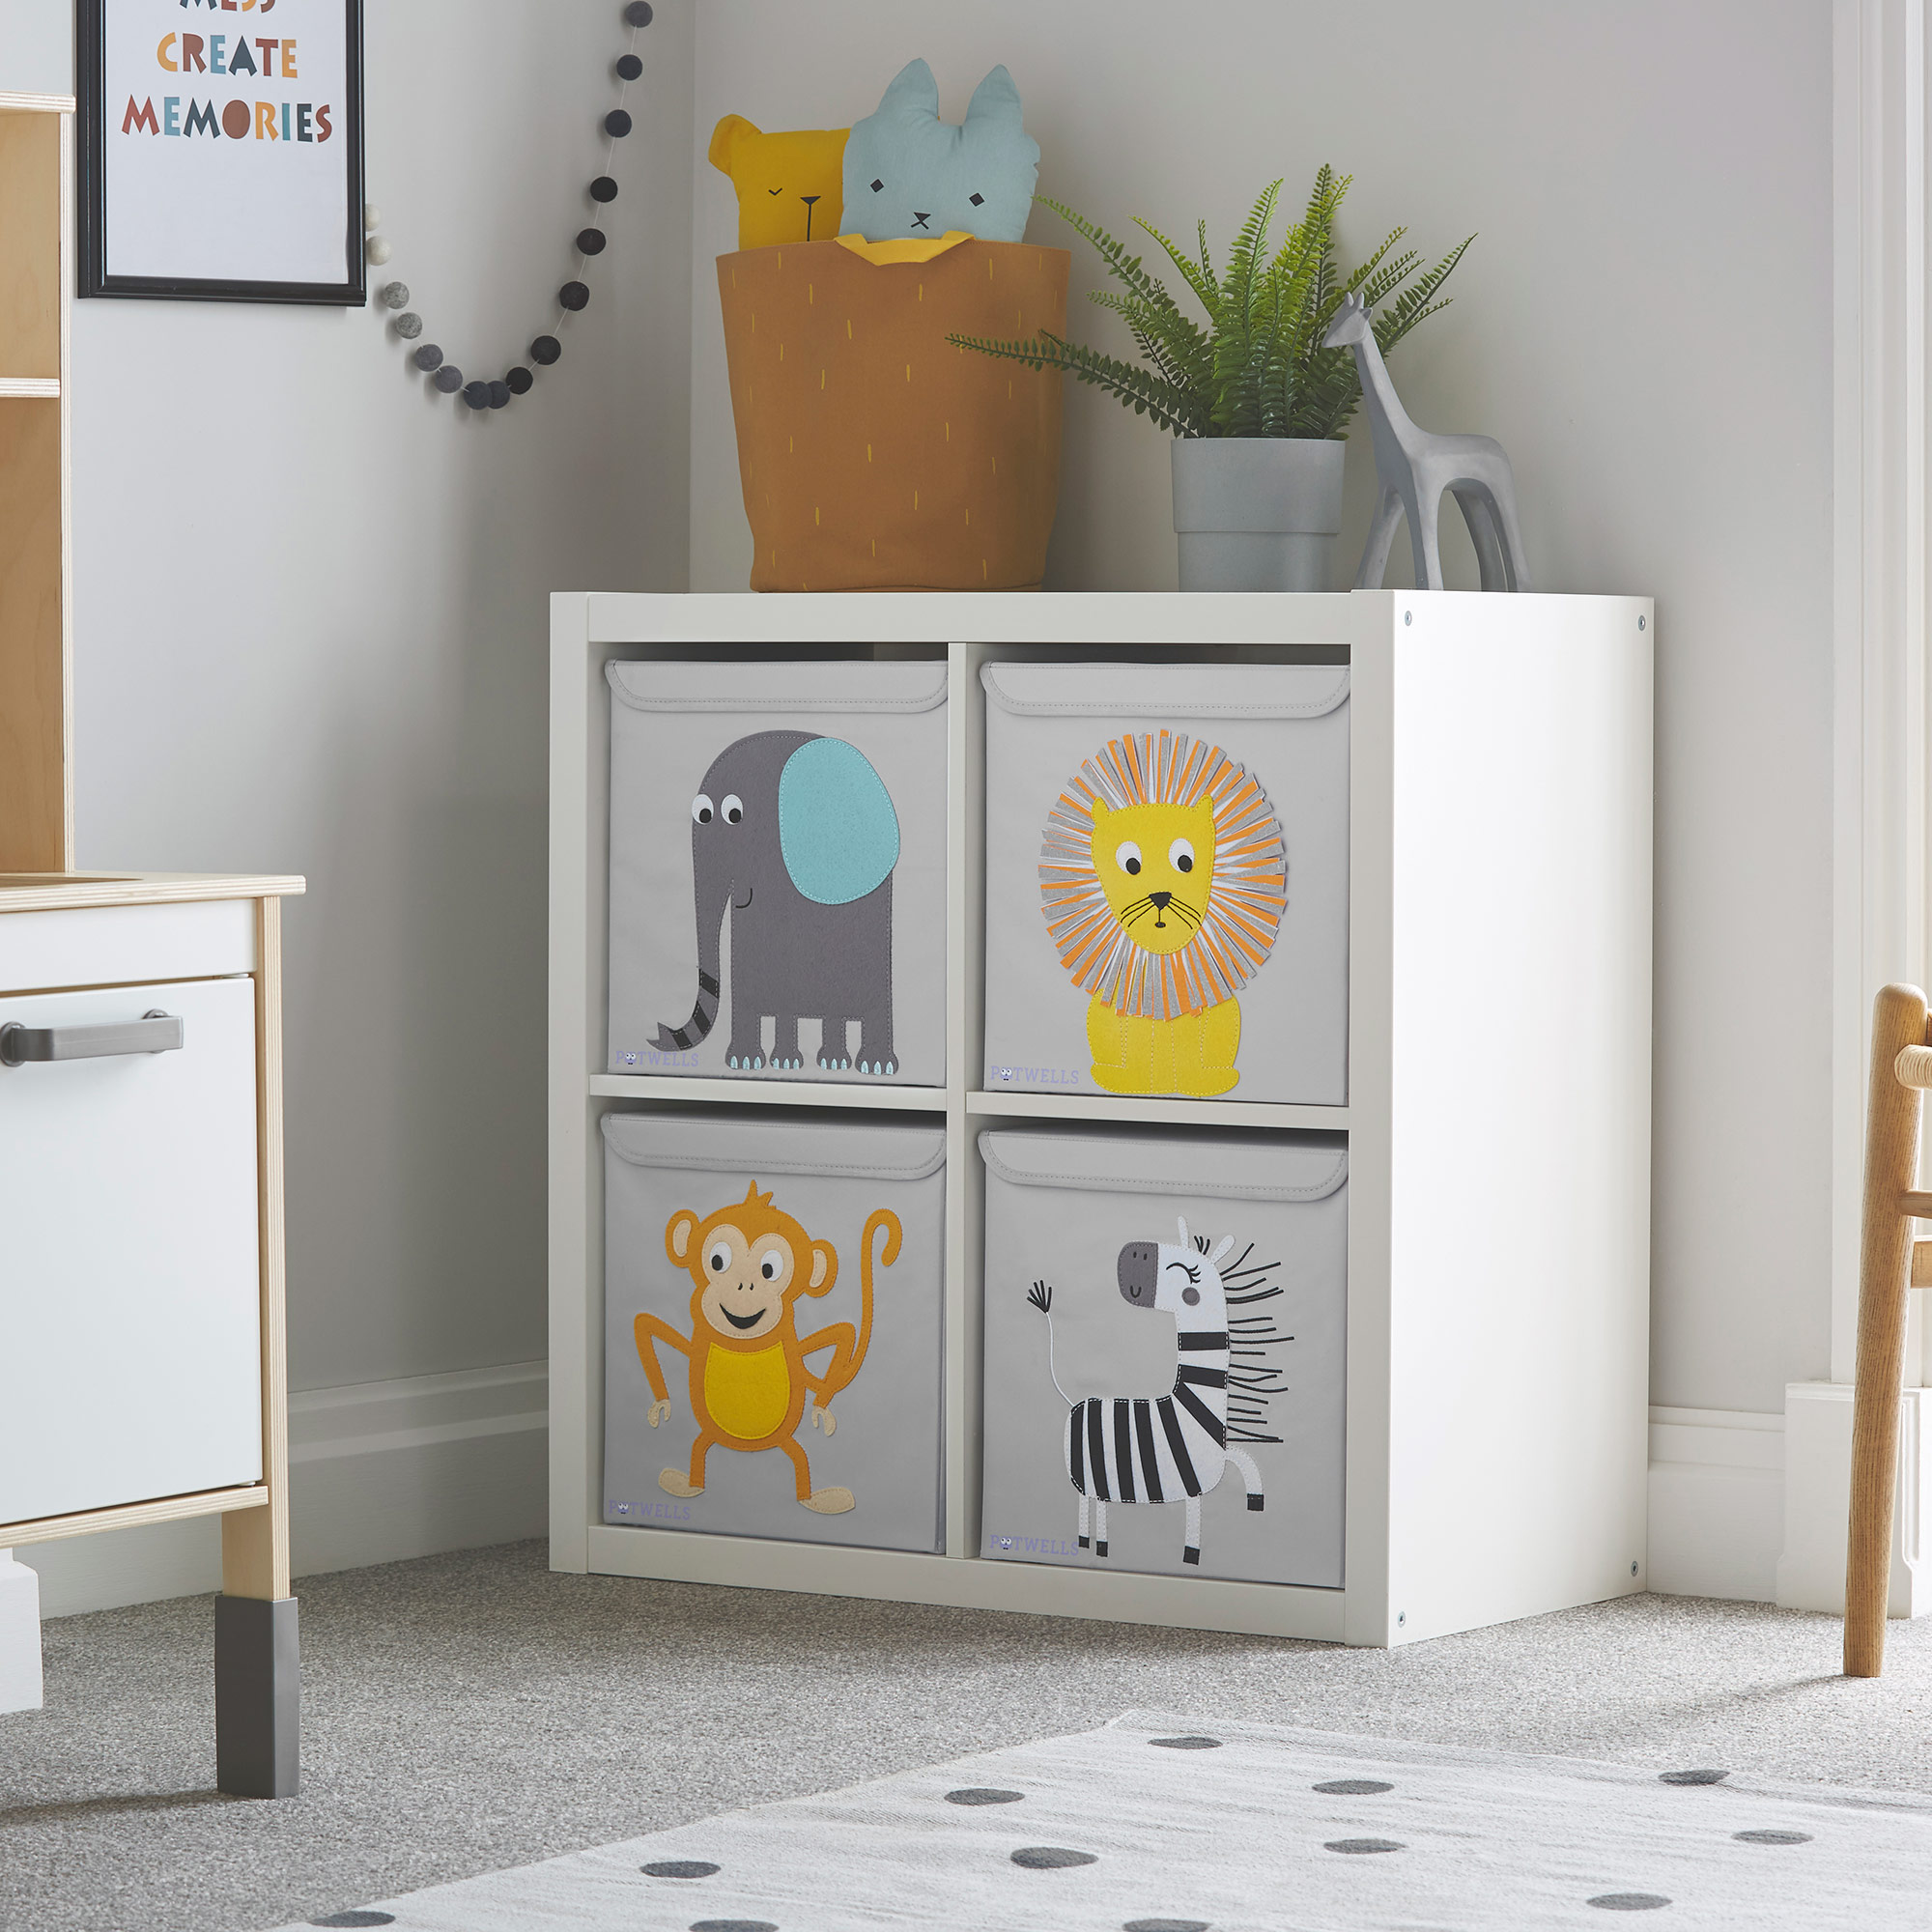 Potwells Nursery Storage Box - Kids/Children's Toys etc | eBay